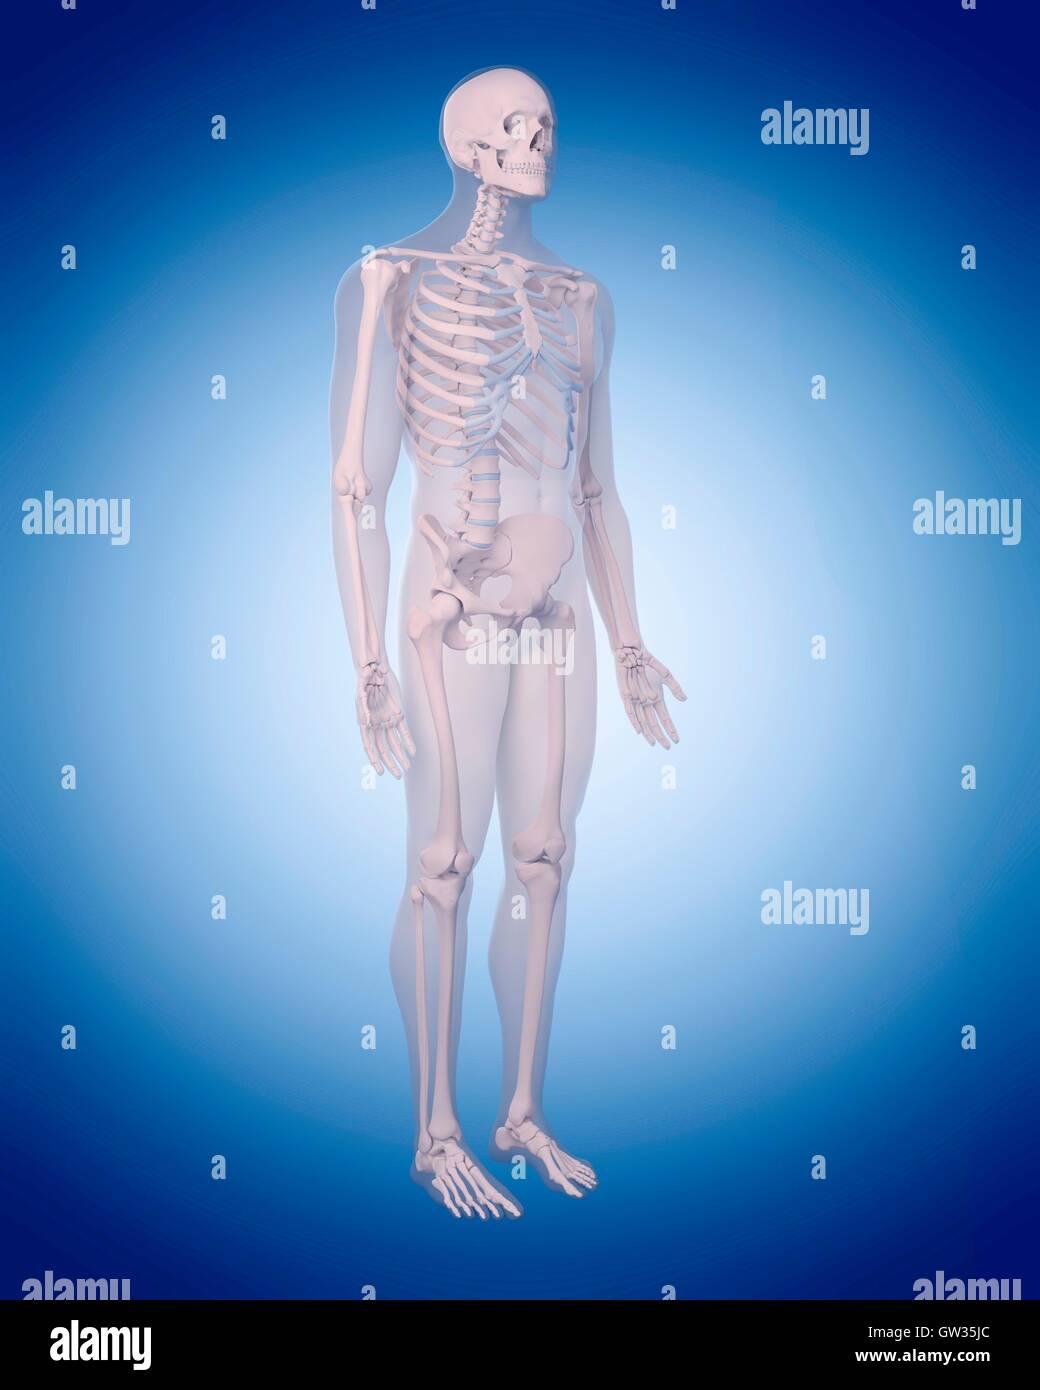 Menschliches Skelett, Abbildung. Stockbild